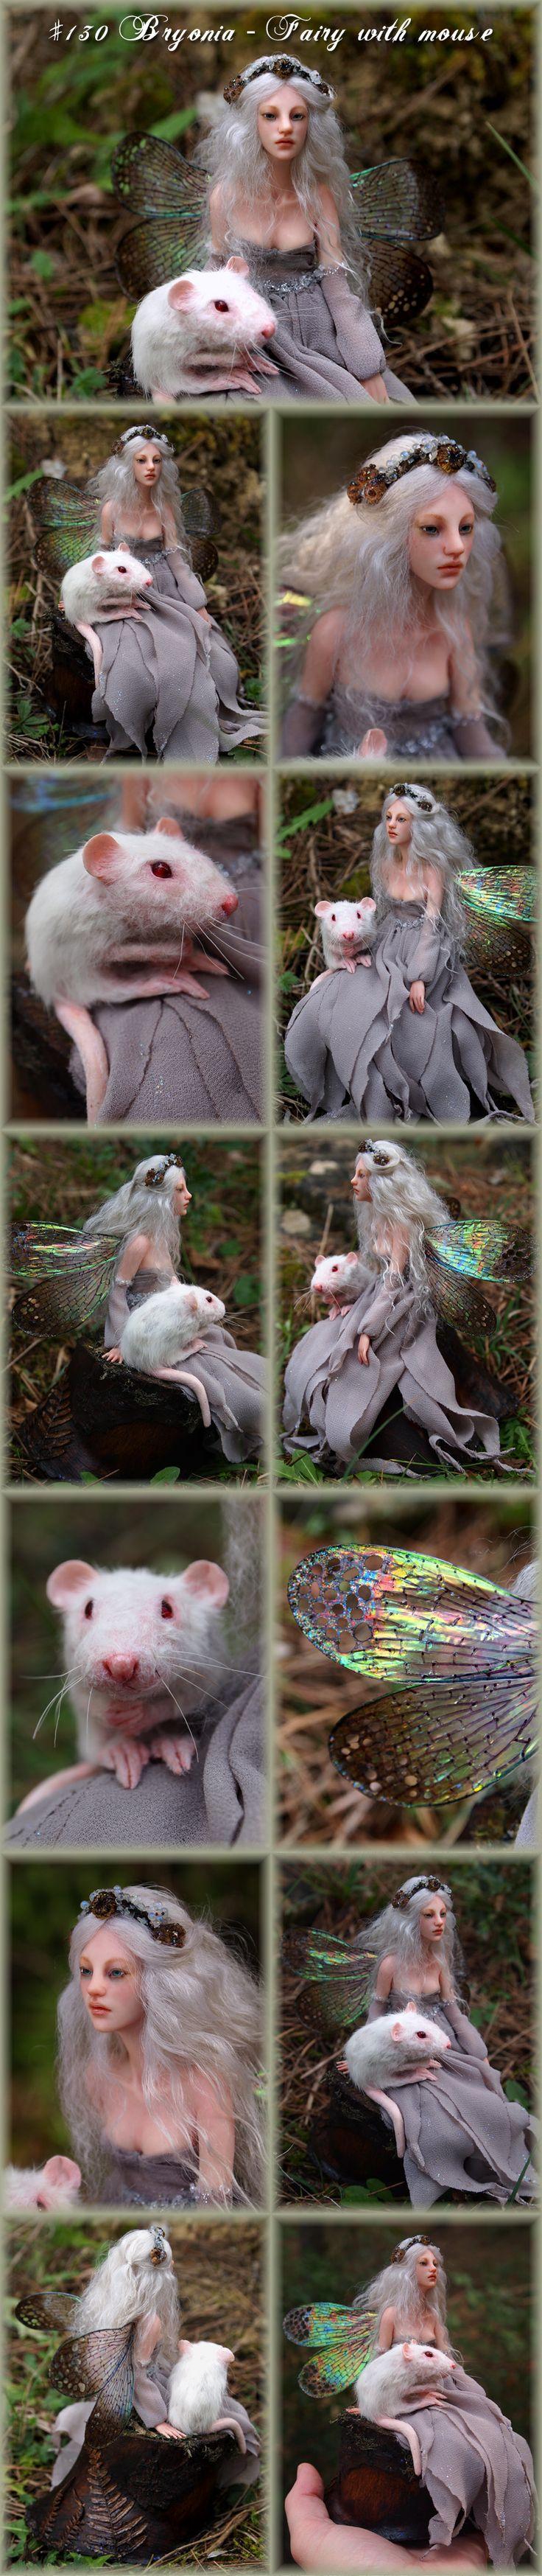 Nenúfar Blanco ~ #130 Bryonia - Fairy with mouse